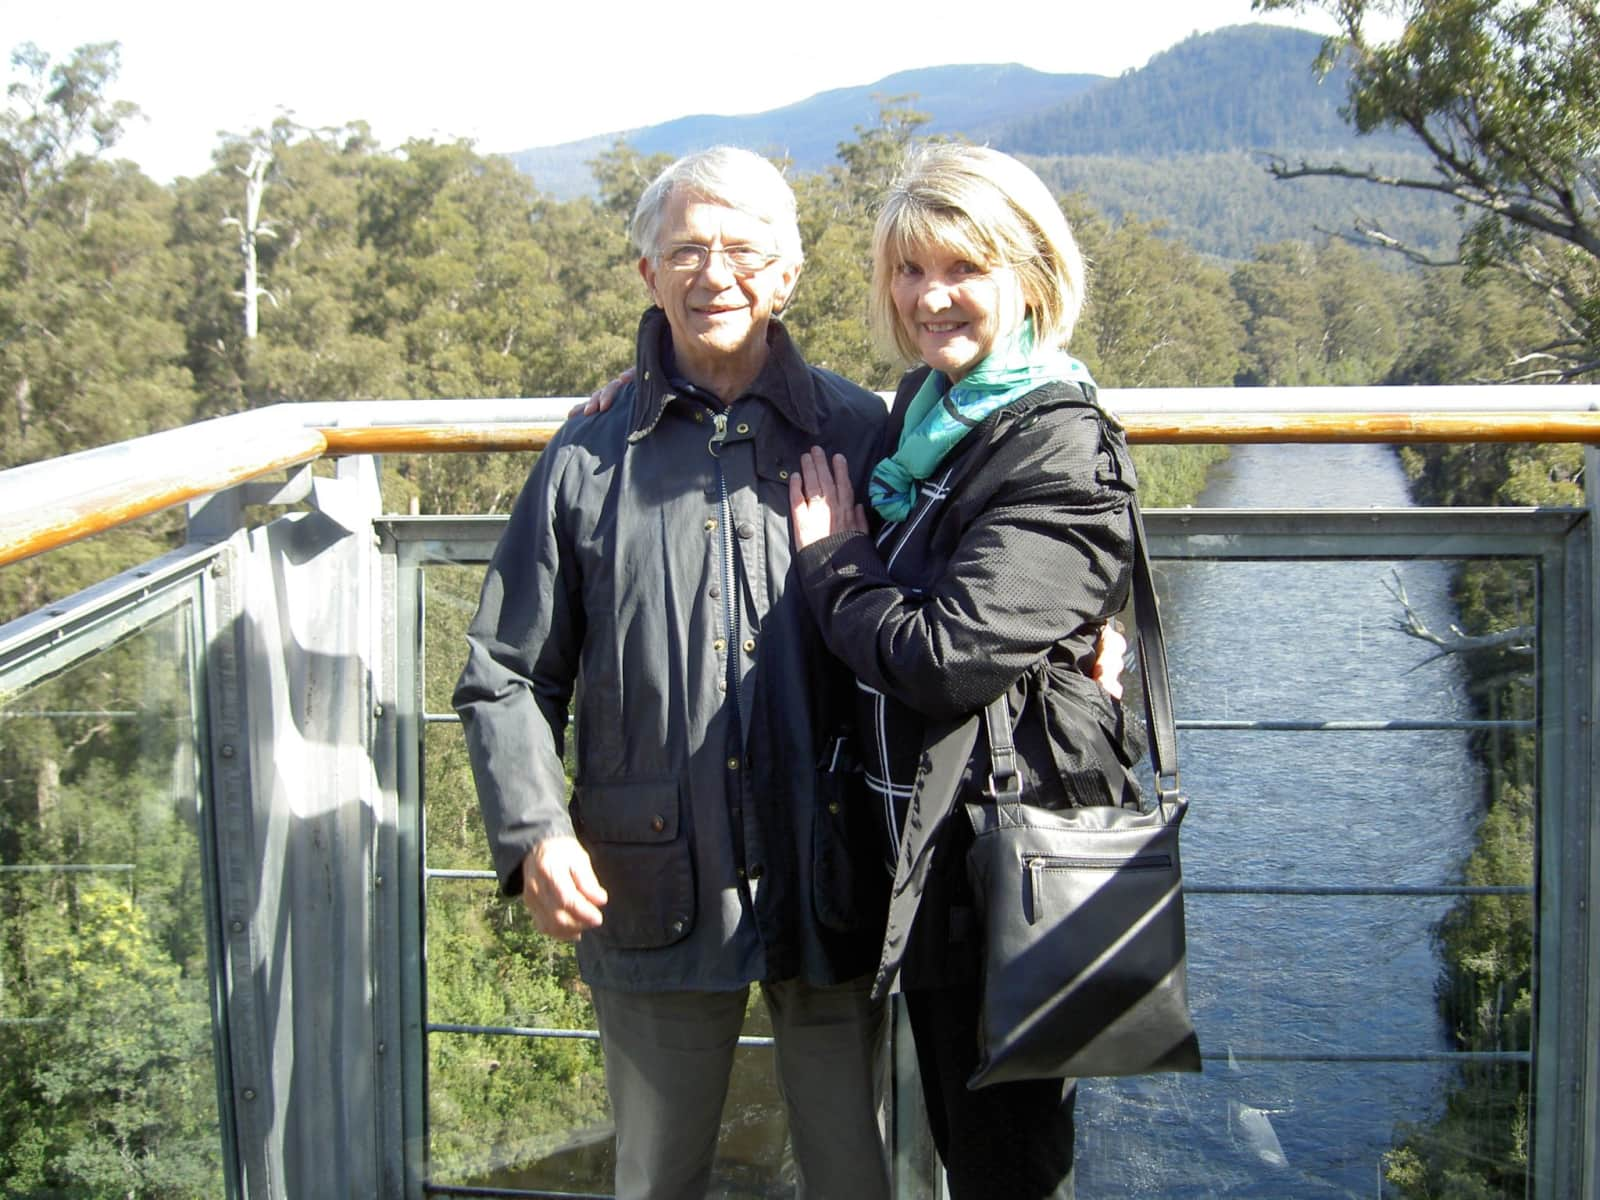 Lynda & Dj from Wellington, New Zealand